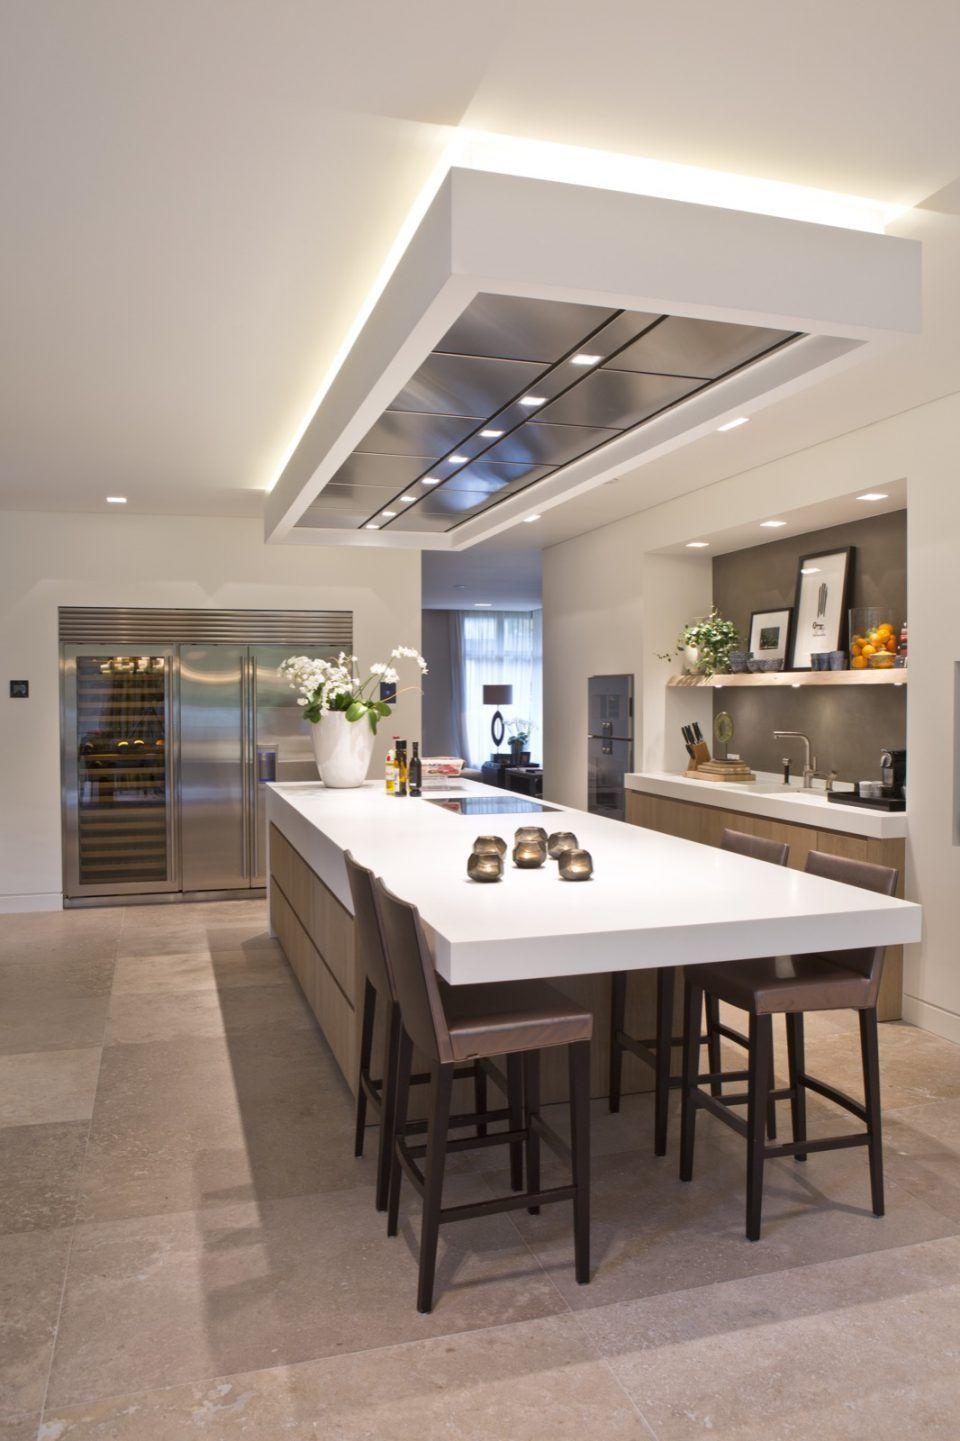 cocina | casas picinas y cines | Pinterest | Cocinas, Cocina moderna ...